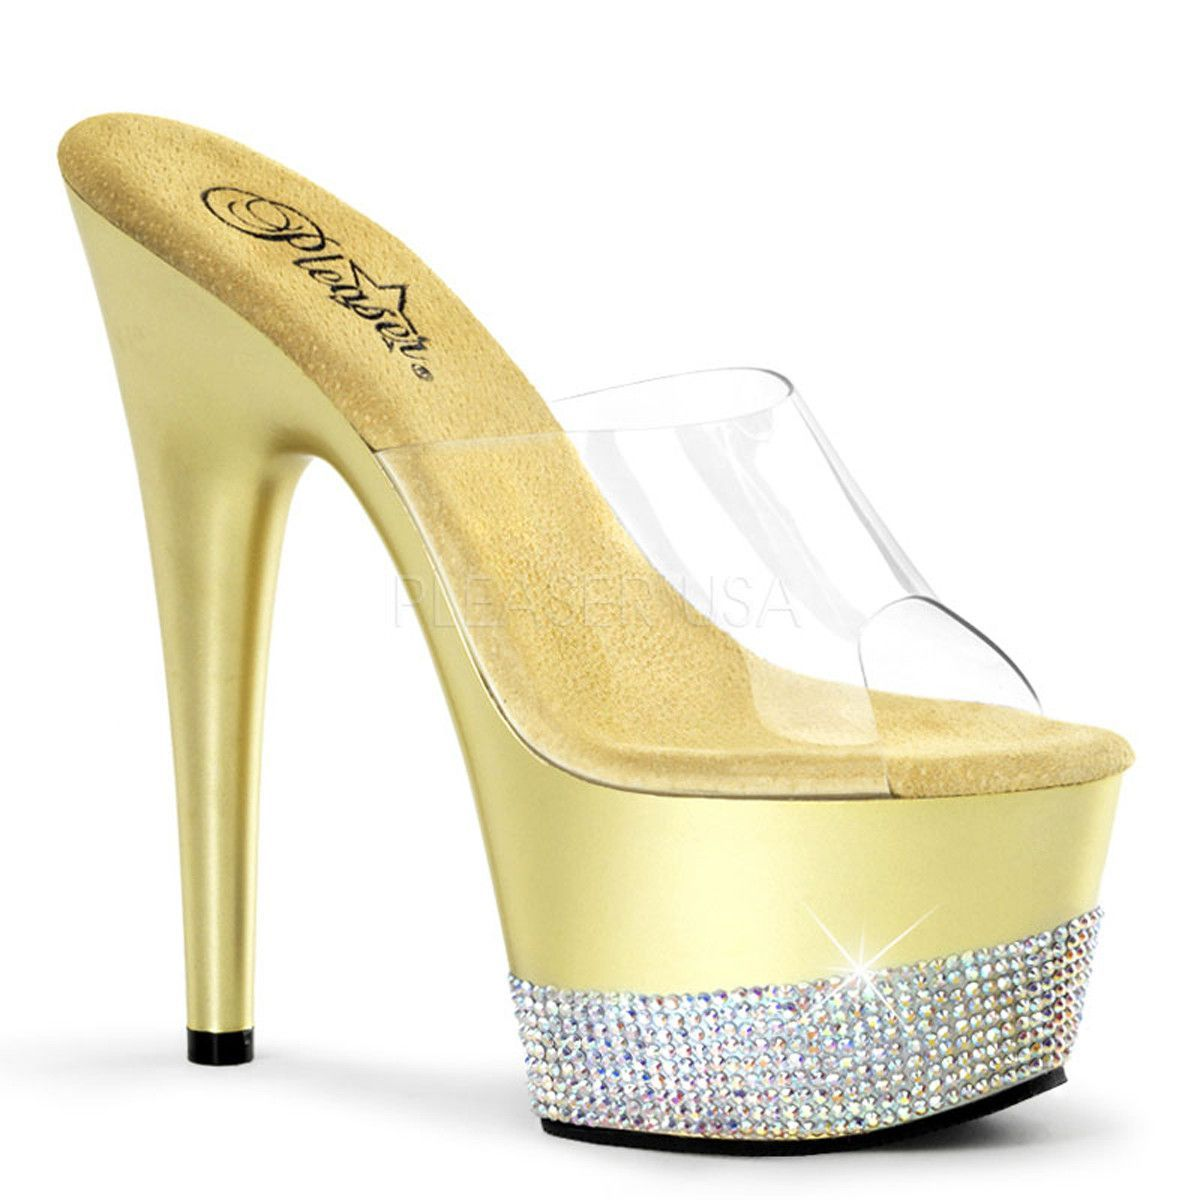 Pleaser Bejeweled-701lp Clr/gold-Blk Size Uk 2 Eu 35 aL0igHL